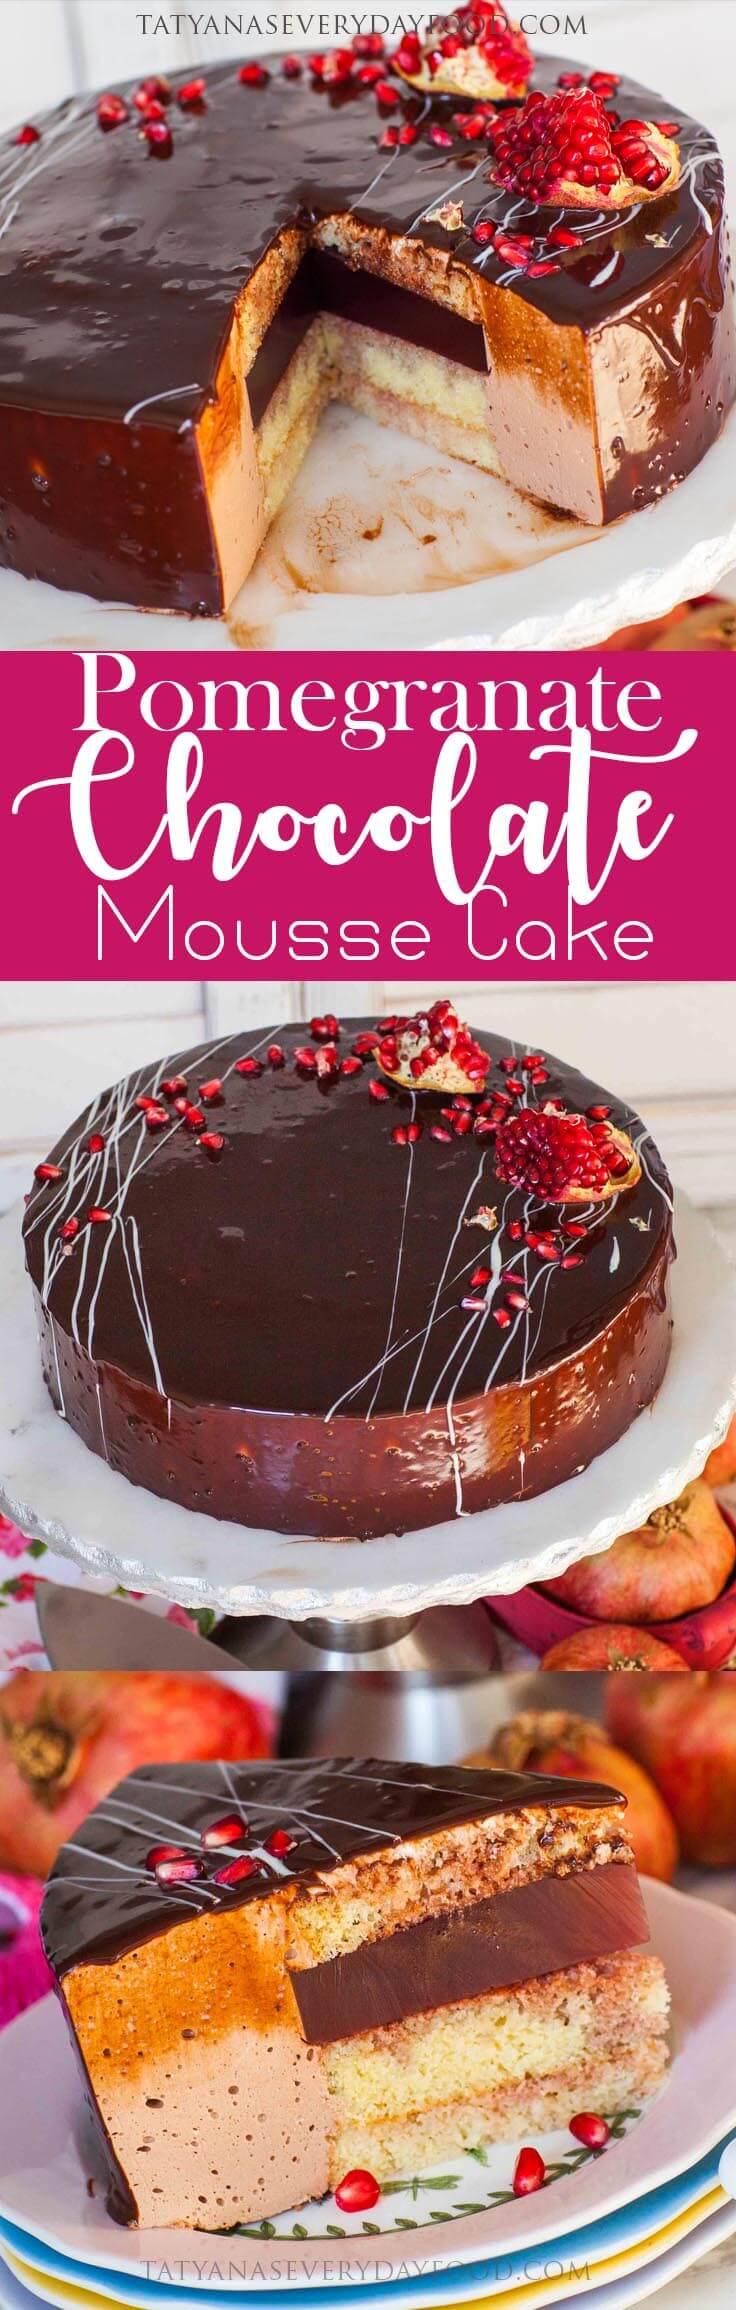 Pomegranate Chocolate Mousse Cake Tatyanas Everyday Food